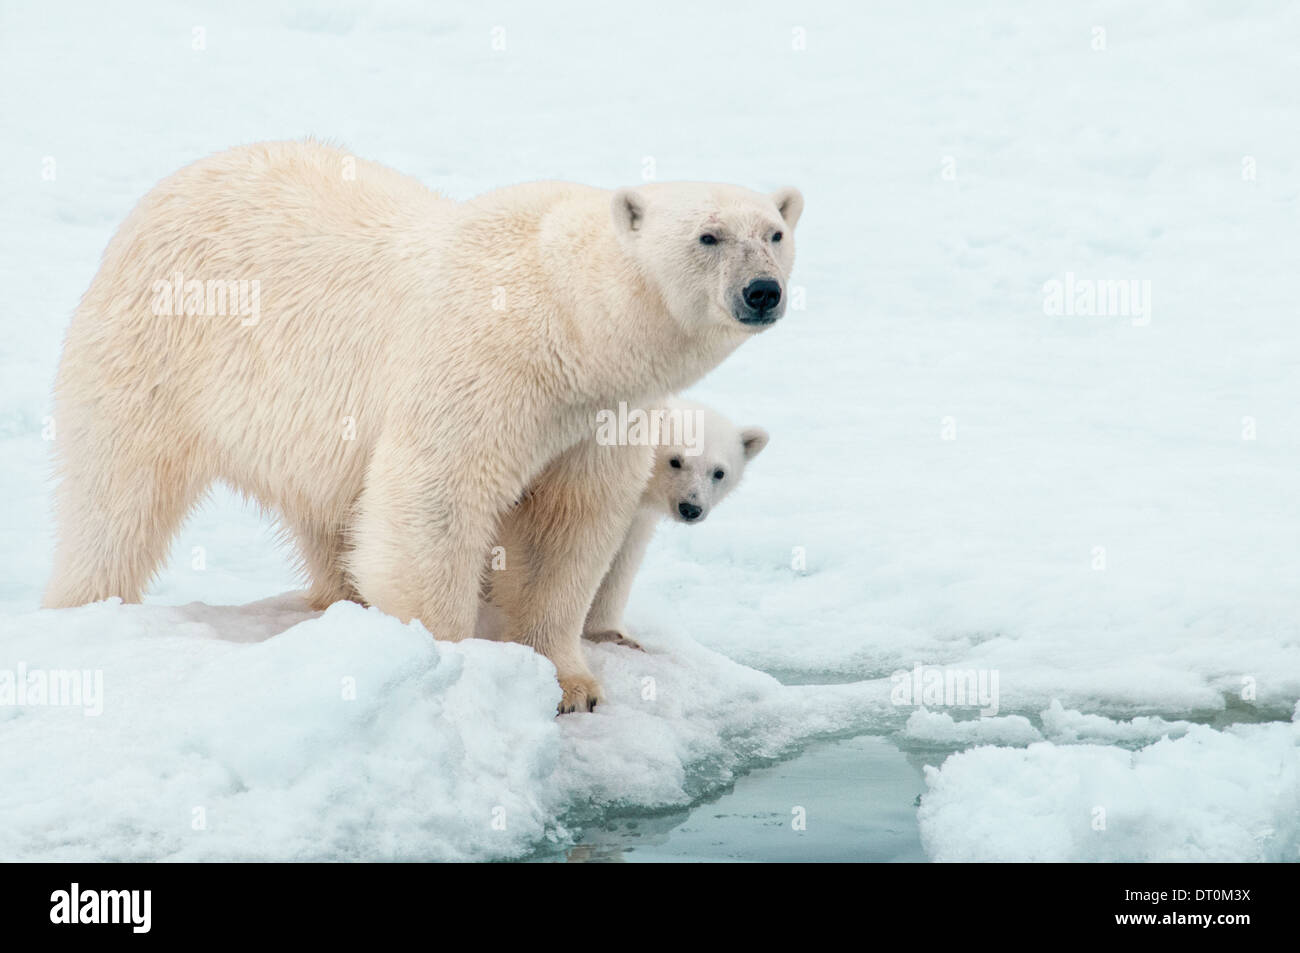 Polar Bear Mother with Cub hiding behind her, Ursus maritimus, Olgastretet Pack Ice, Spitsbergen, Svalbard Archipelago, Norway - Stock Image